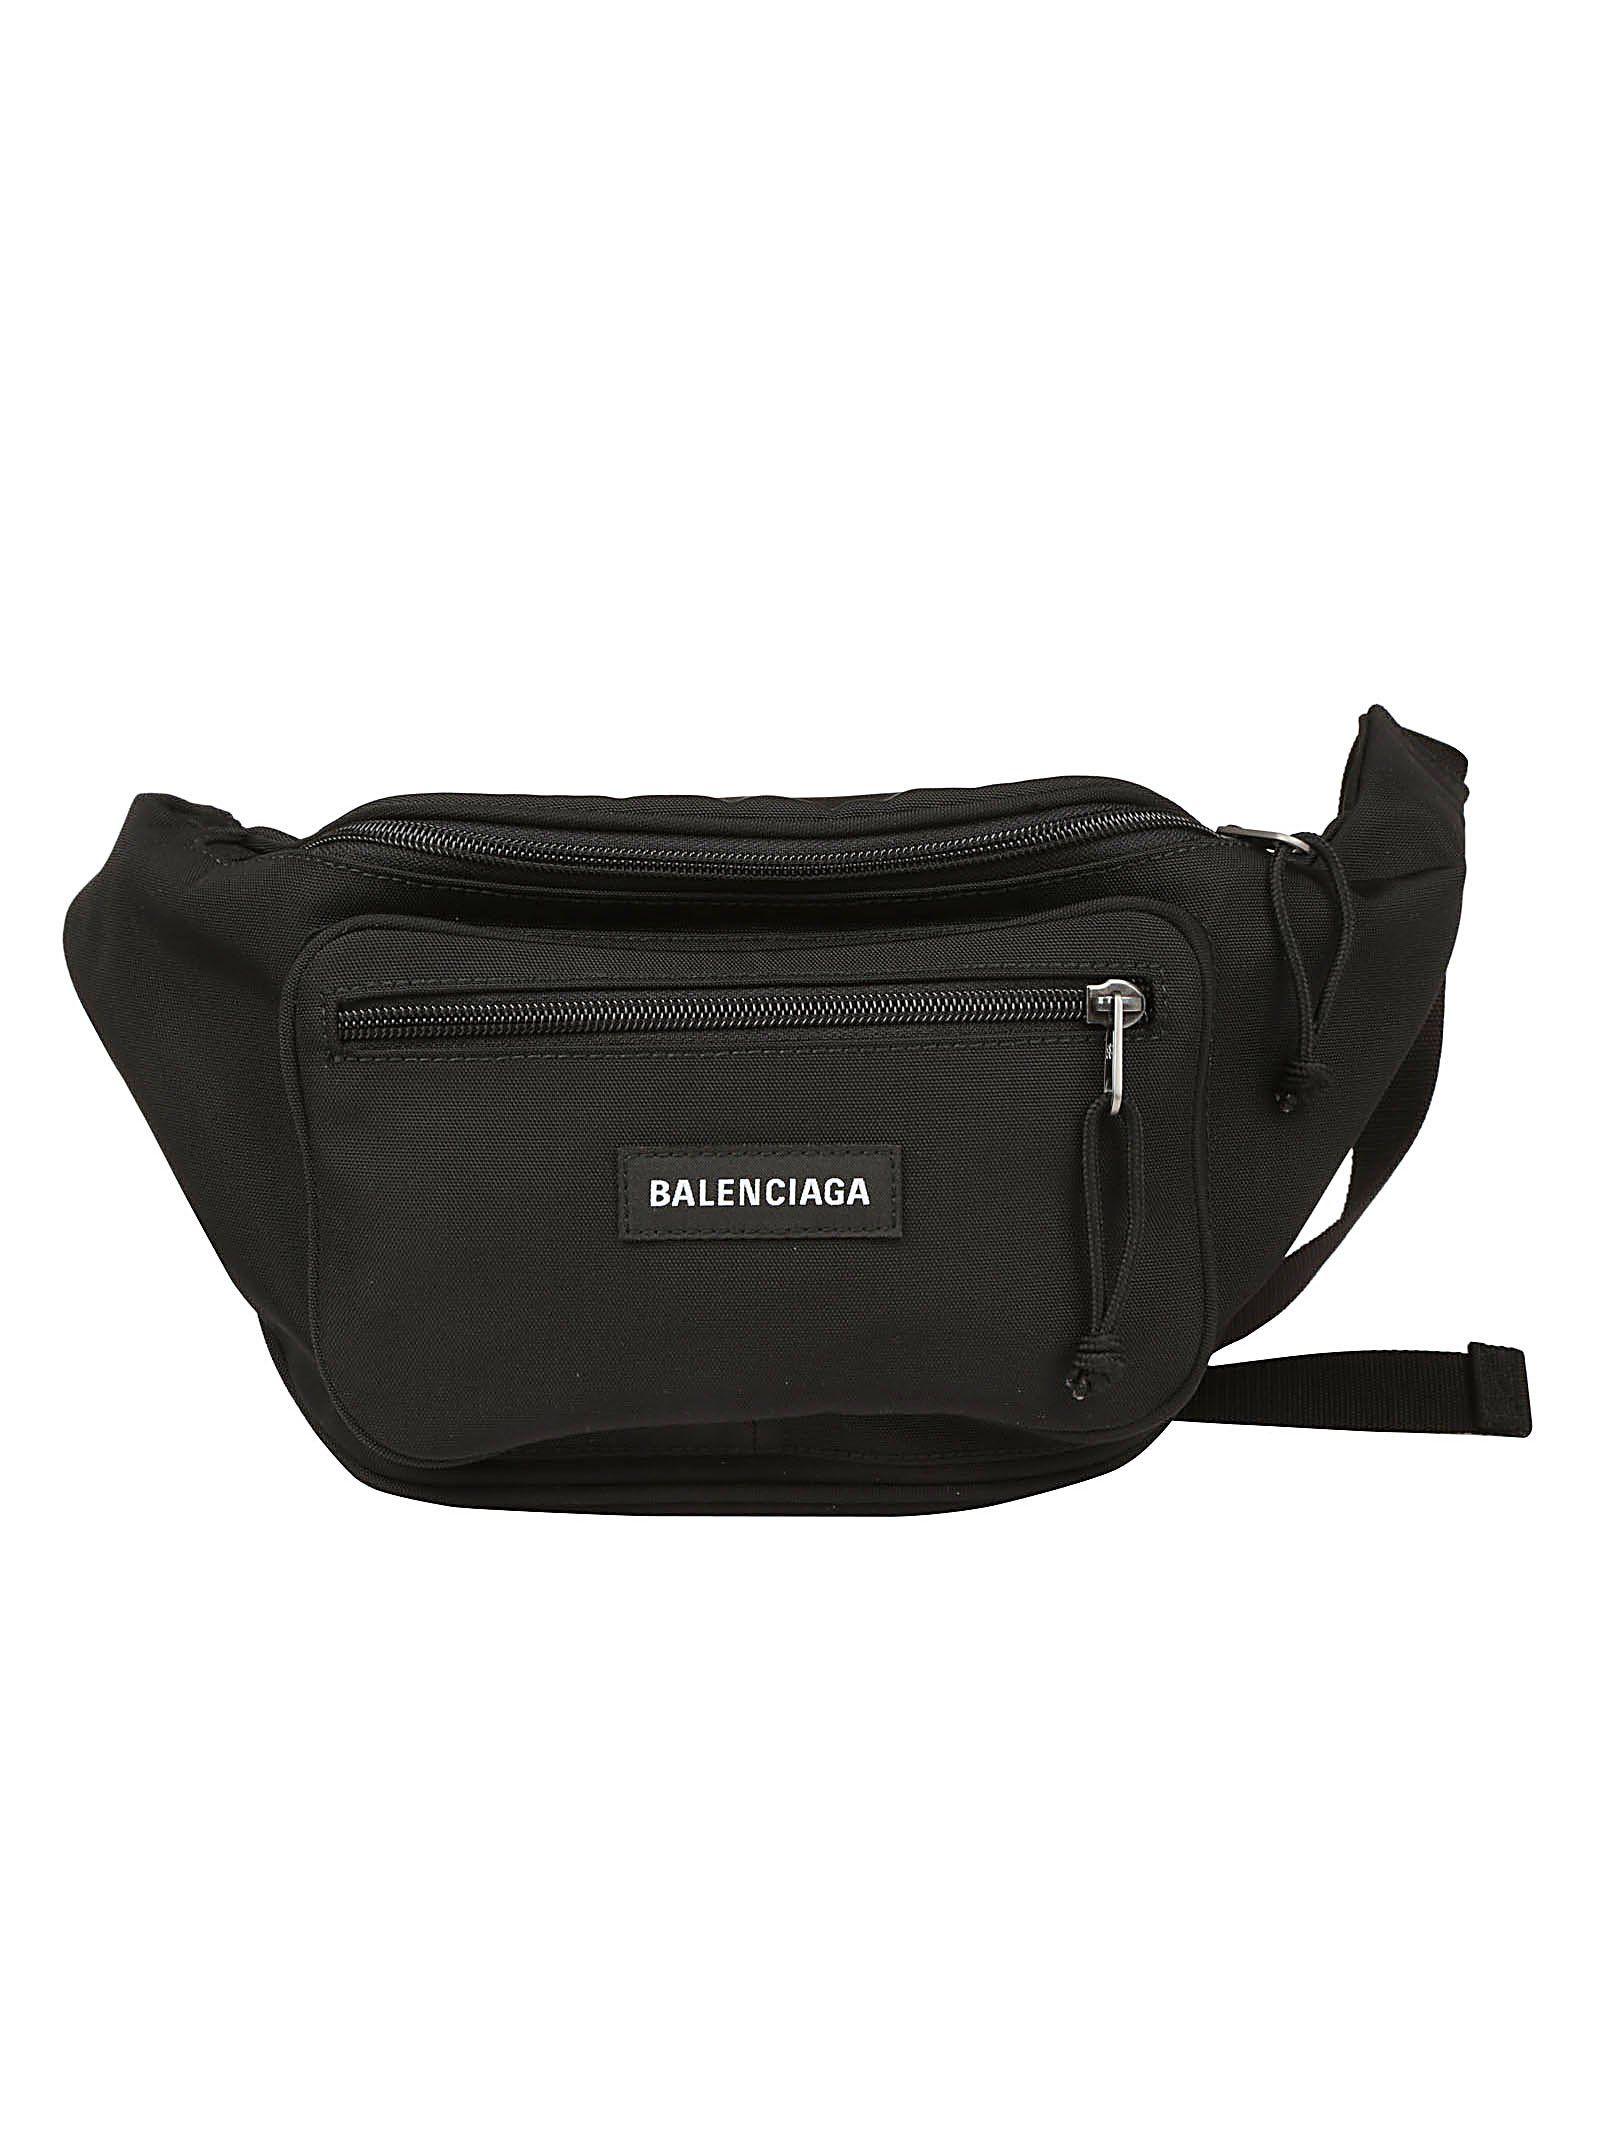 2f0af363453 BALENCIAGA BALENCIAGA EXPLORER LOGO BELT BAG. #balenciaga #bags #belt bags  #nylon